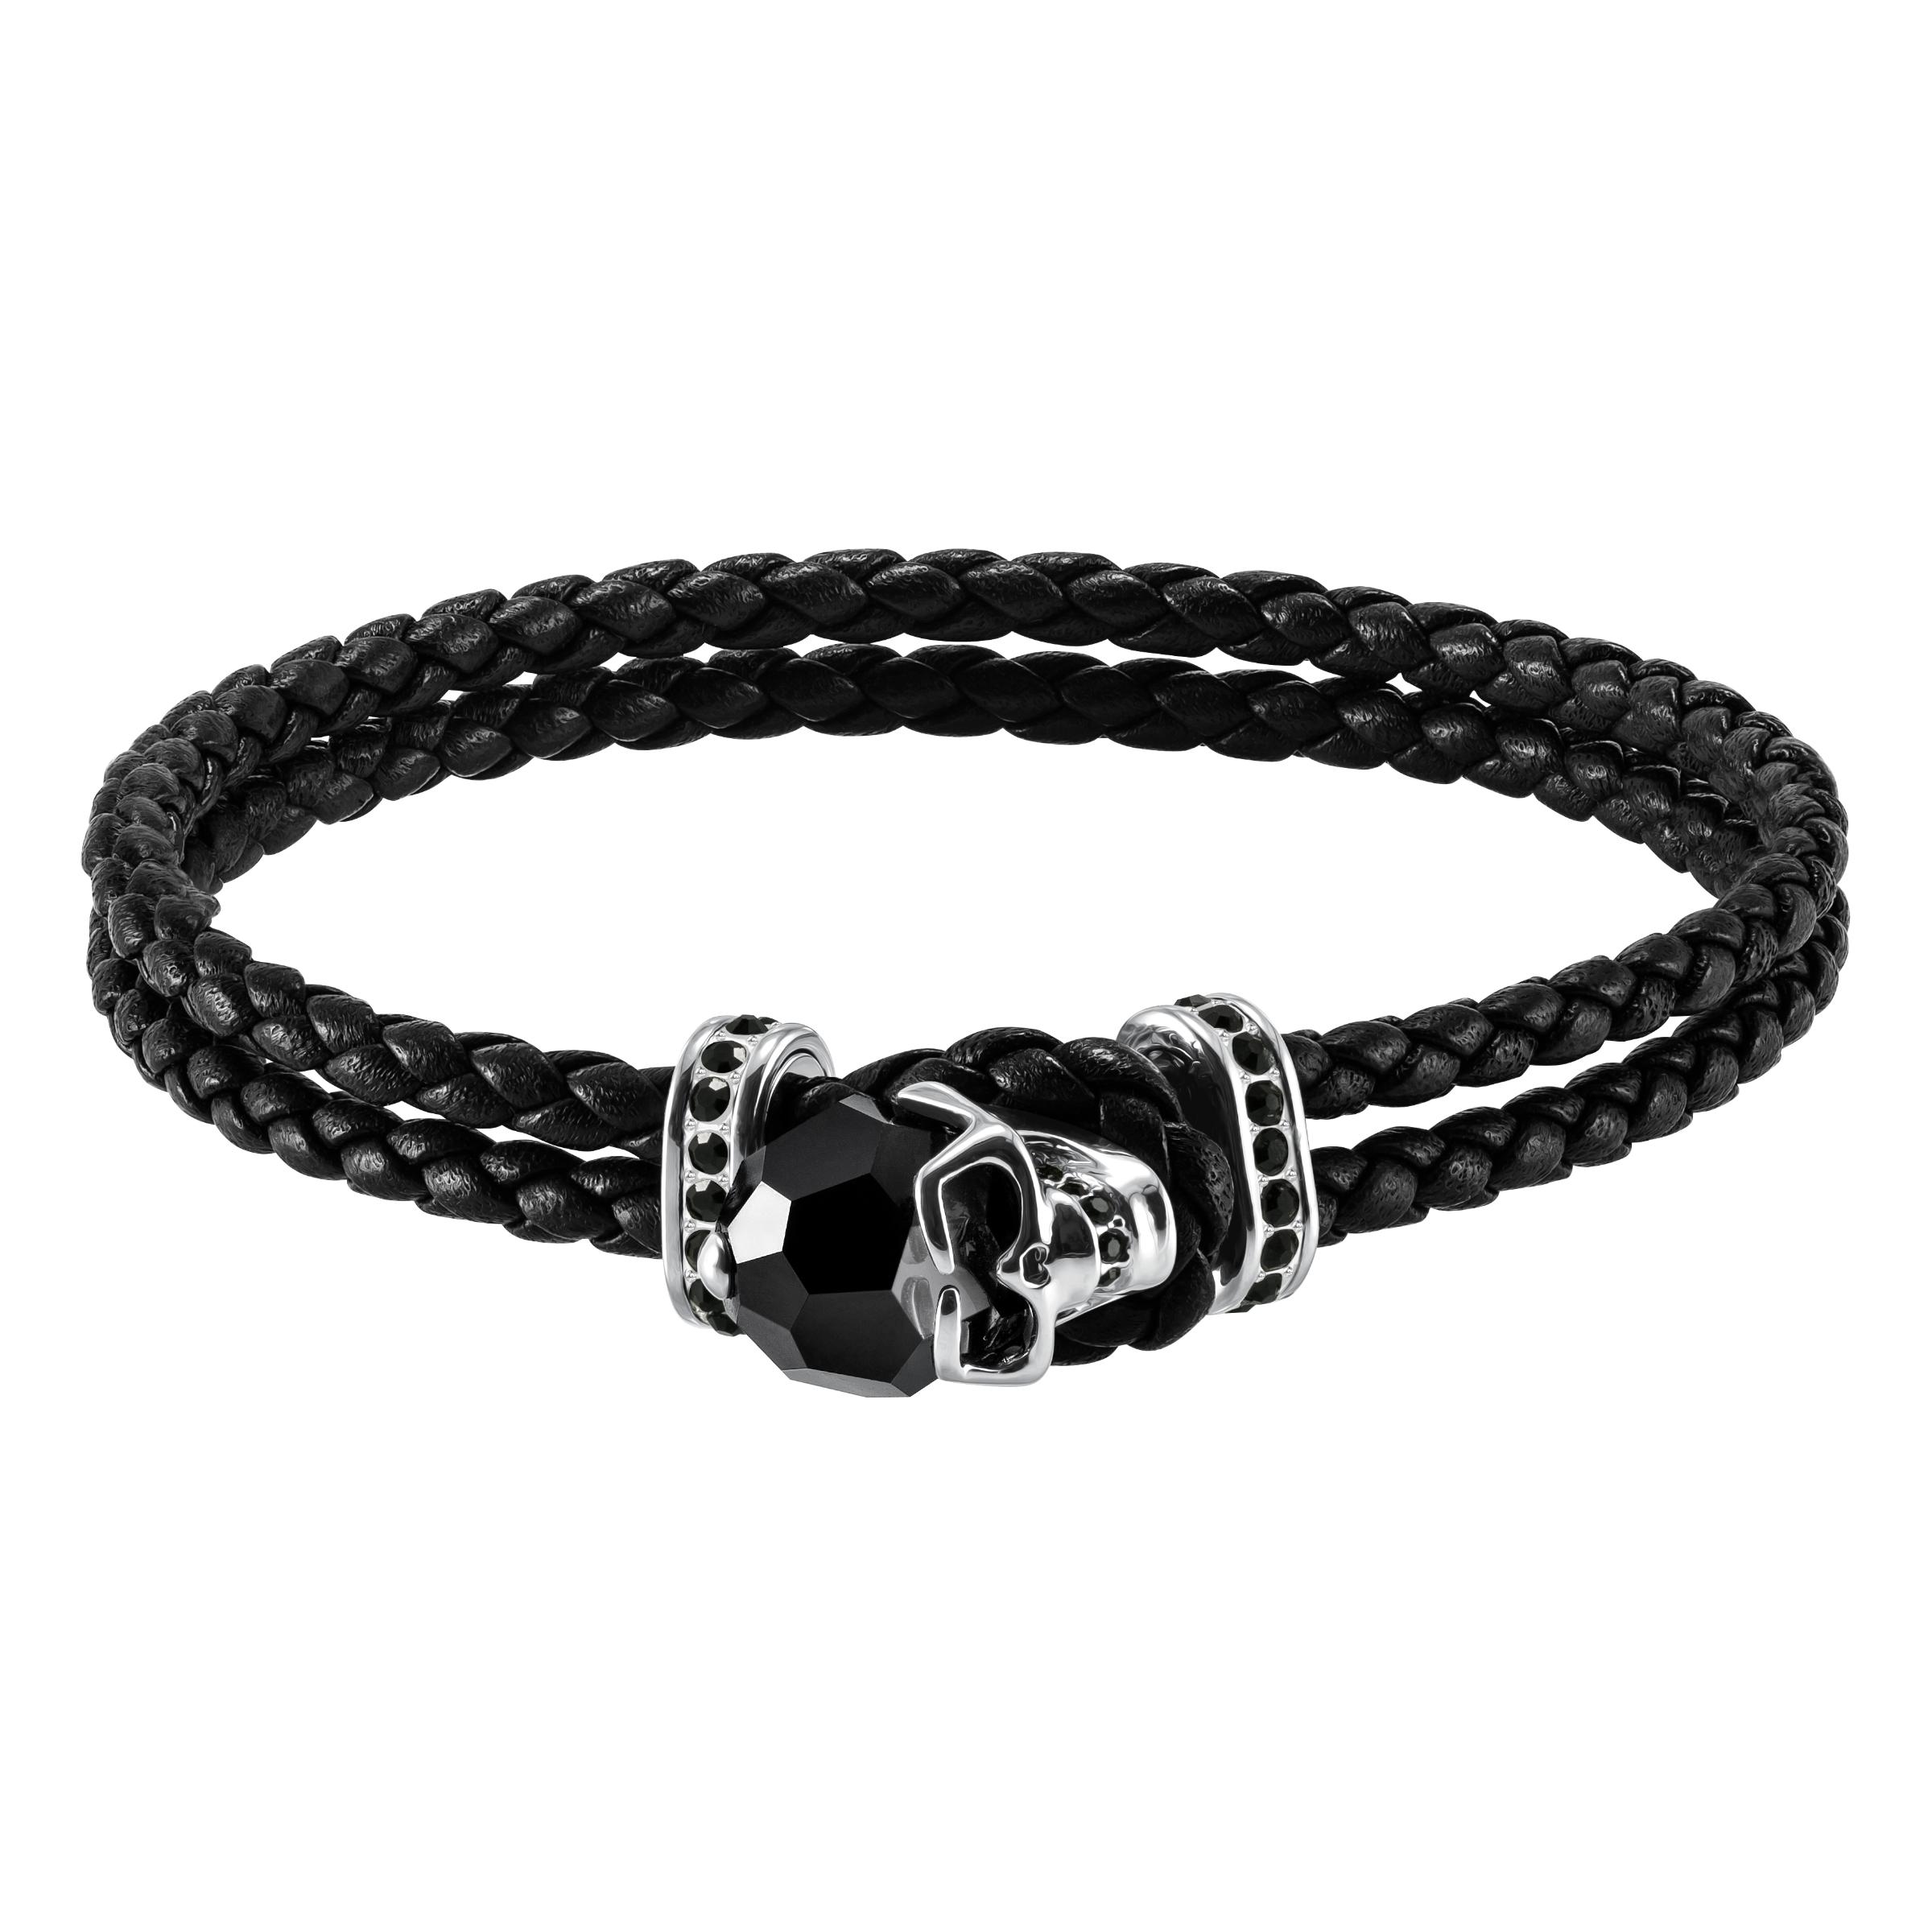 Taddeo Bracelet, Black, Palladium Plating